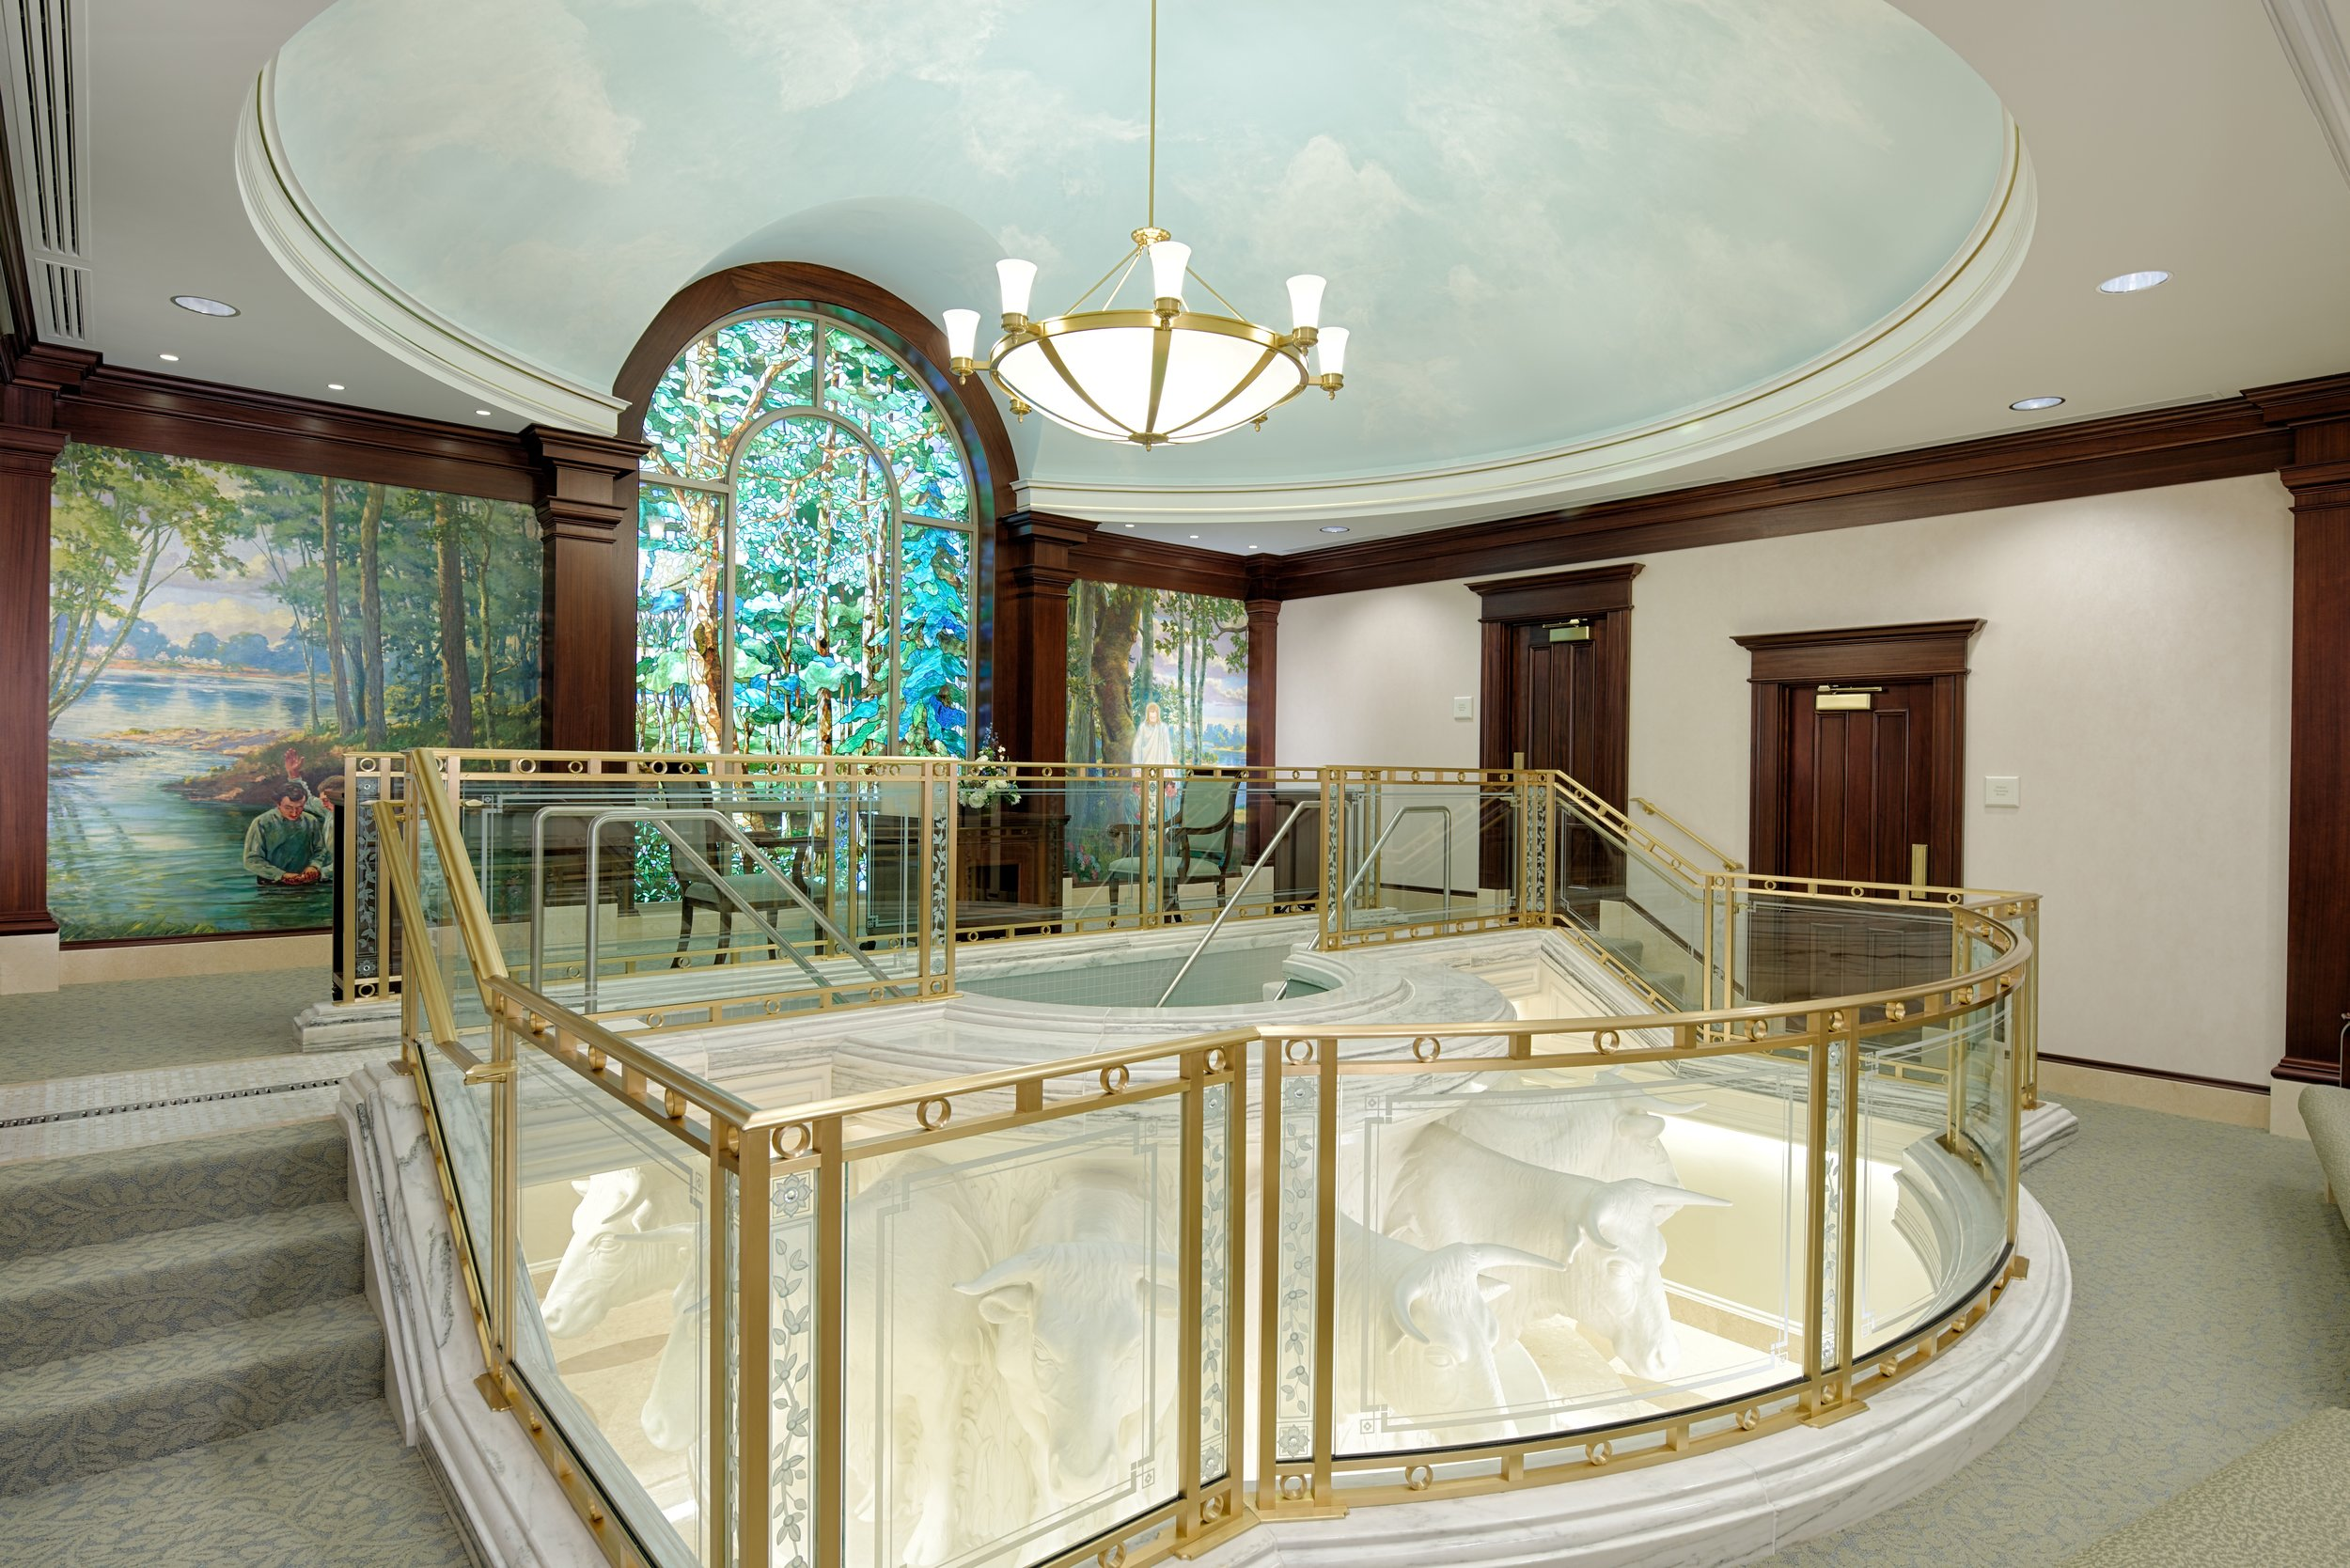 Holdman_Studios_Stained_Art_Glass_LDS_Mormon_Temple_Boise_Idaho_Baptistry.jpg